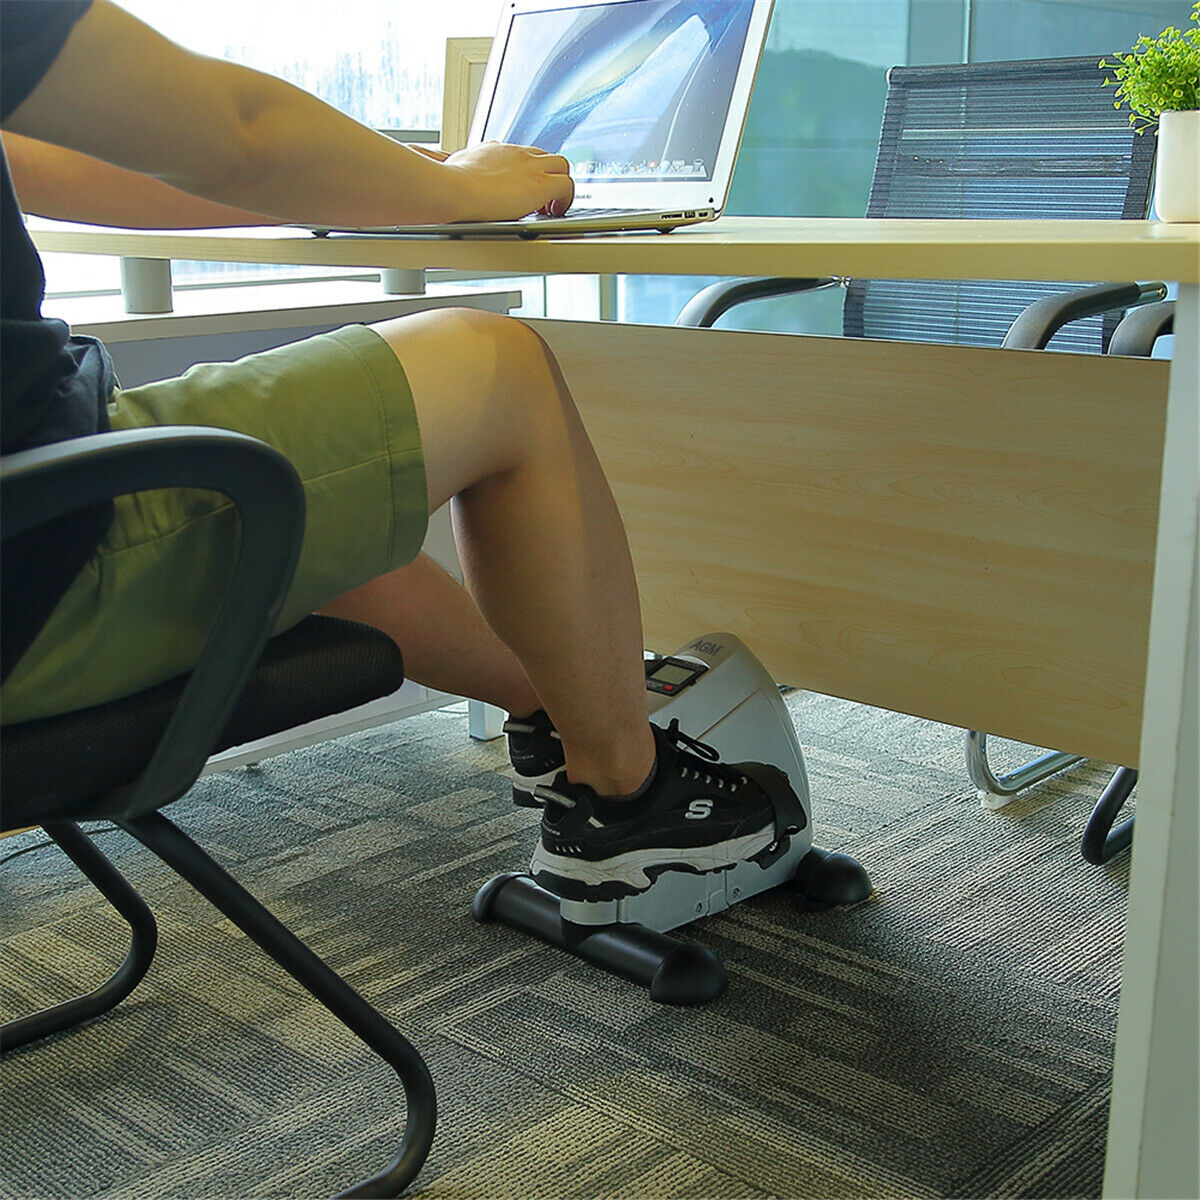 Digital LCD Resistance for Leg and Exerciser